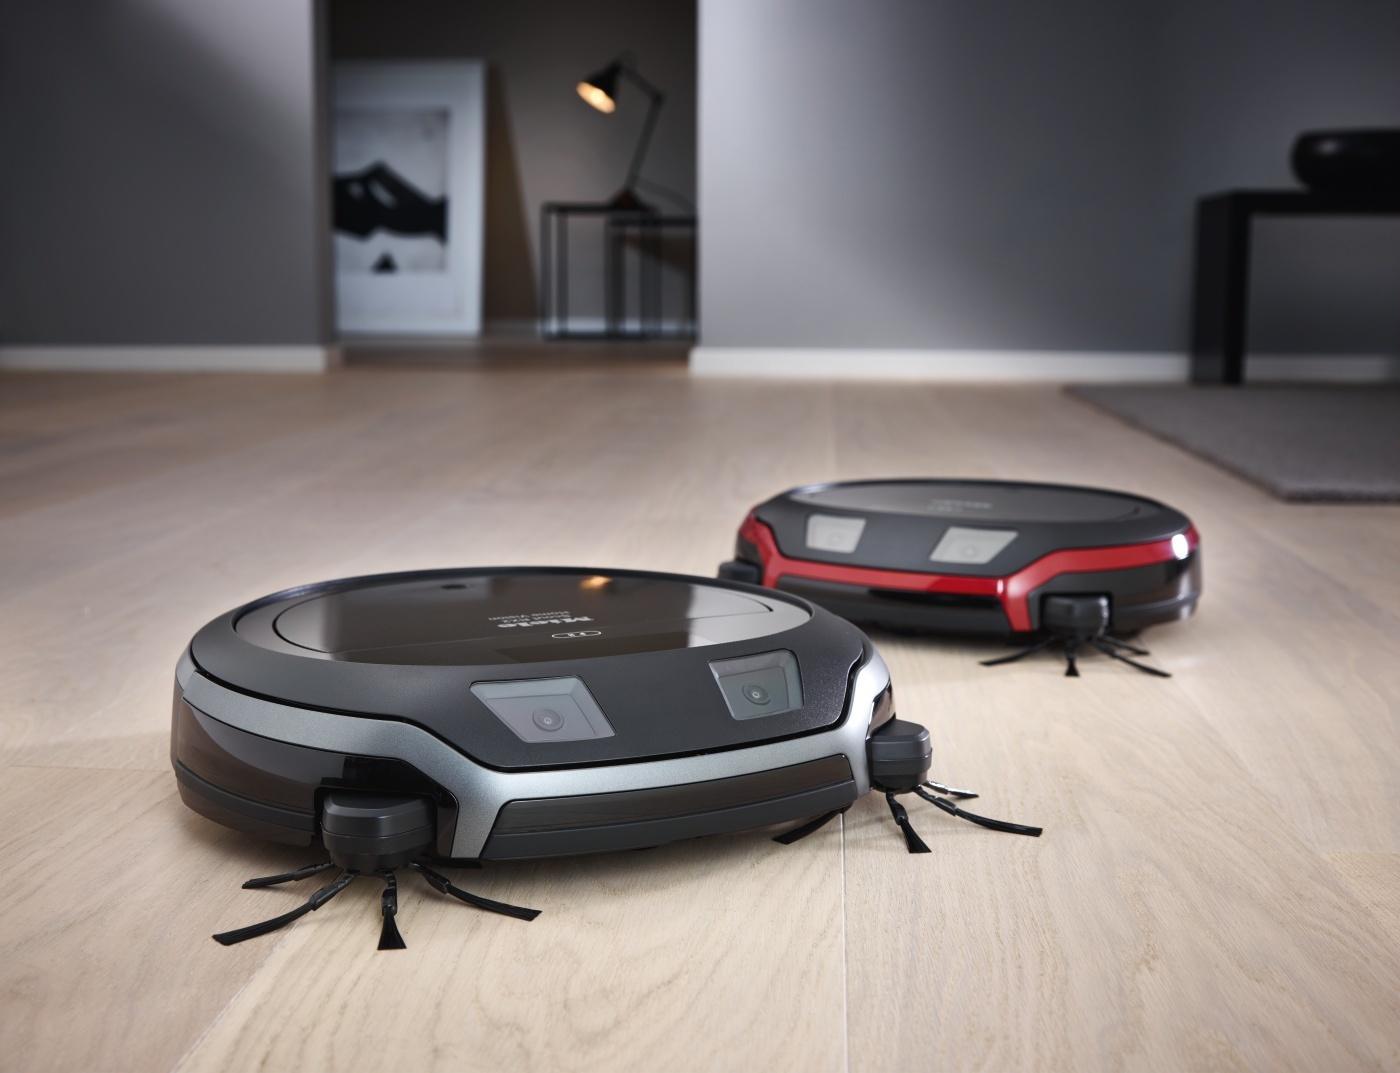 saugroboter neuheiten m rz 2018 testsieger. Black Bedroom Furniture Sets. Home Design Ideas